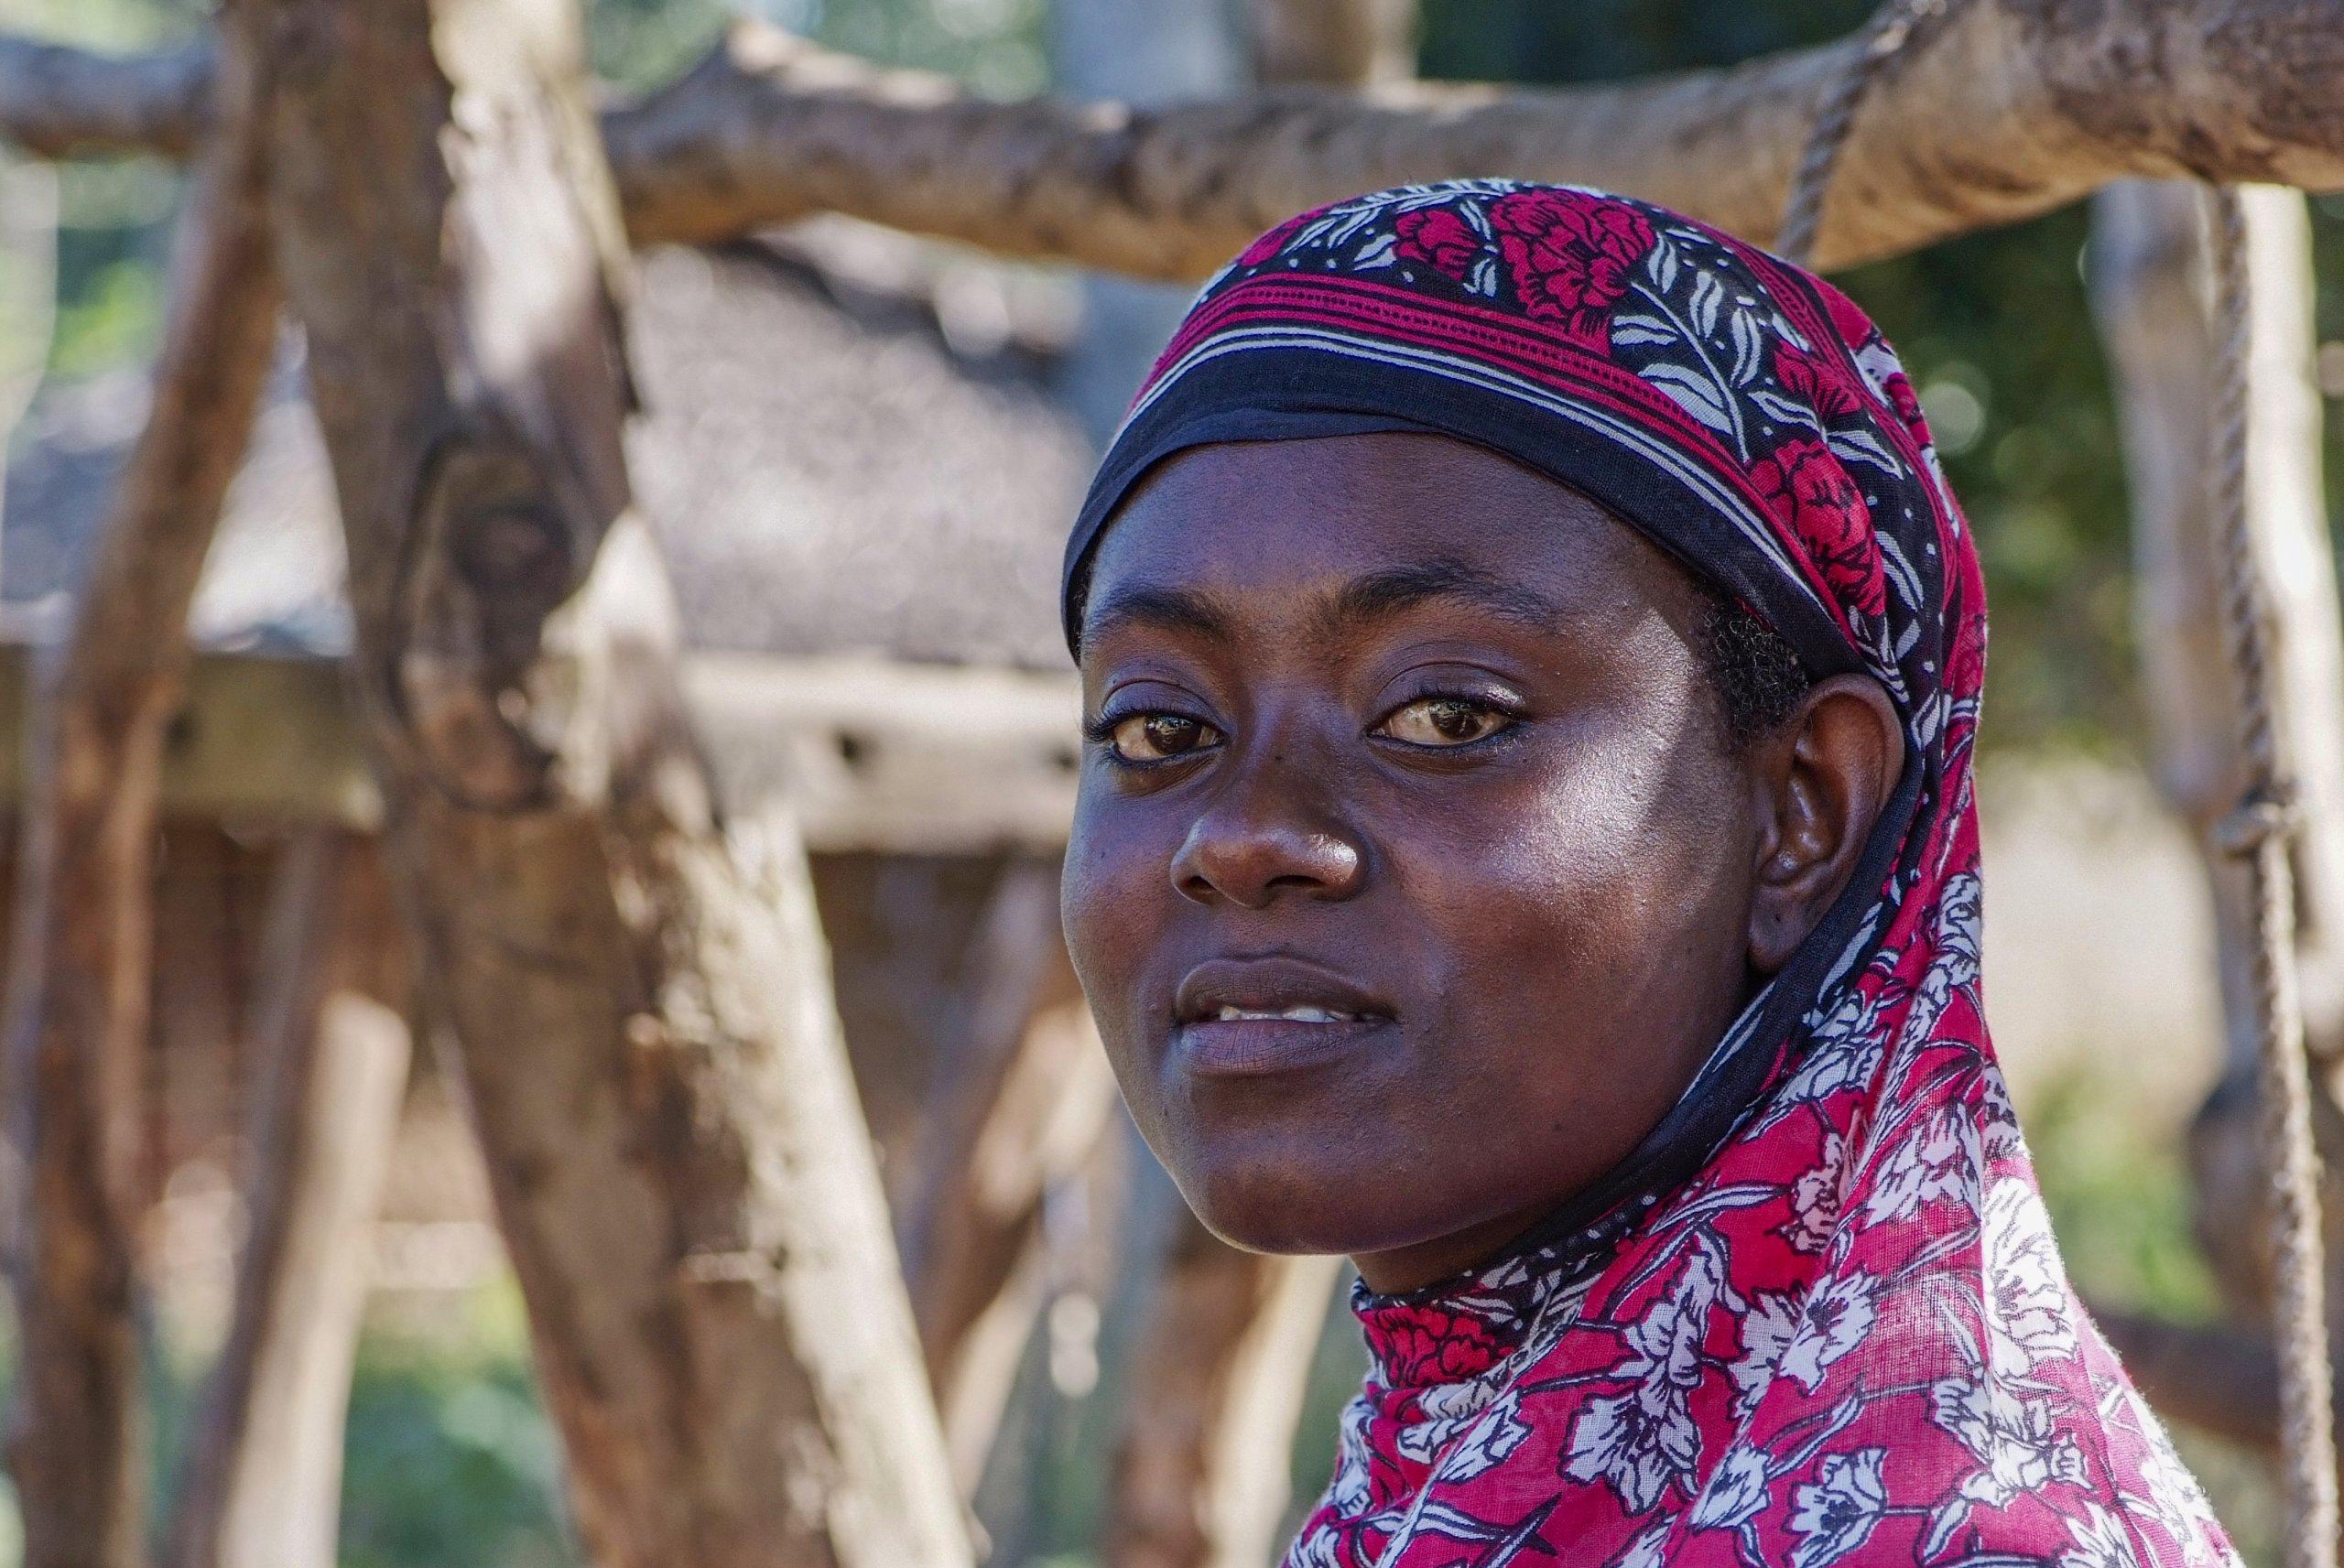 28 04 boerin trotsevrouw Maajabu Simba Pangani Tanzania 5552 scaled